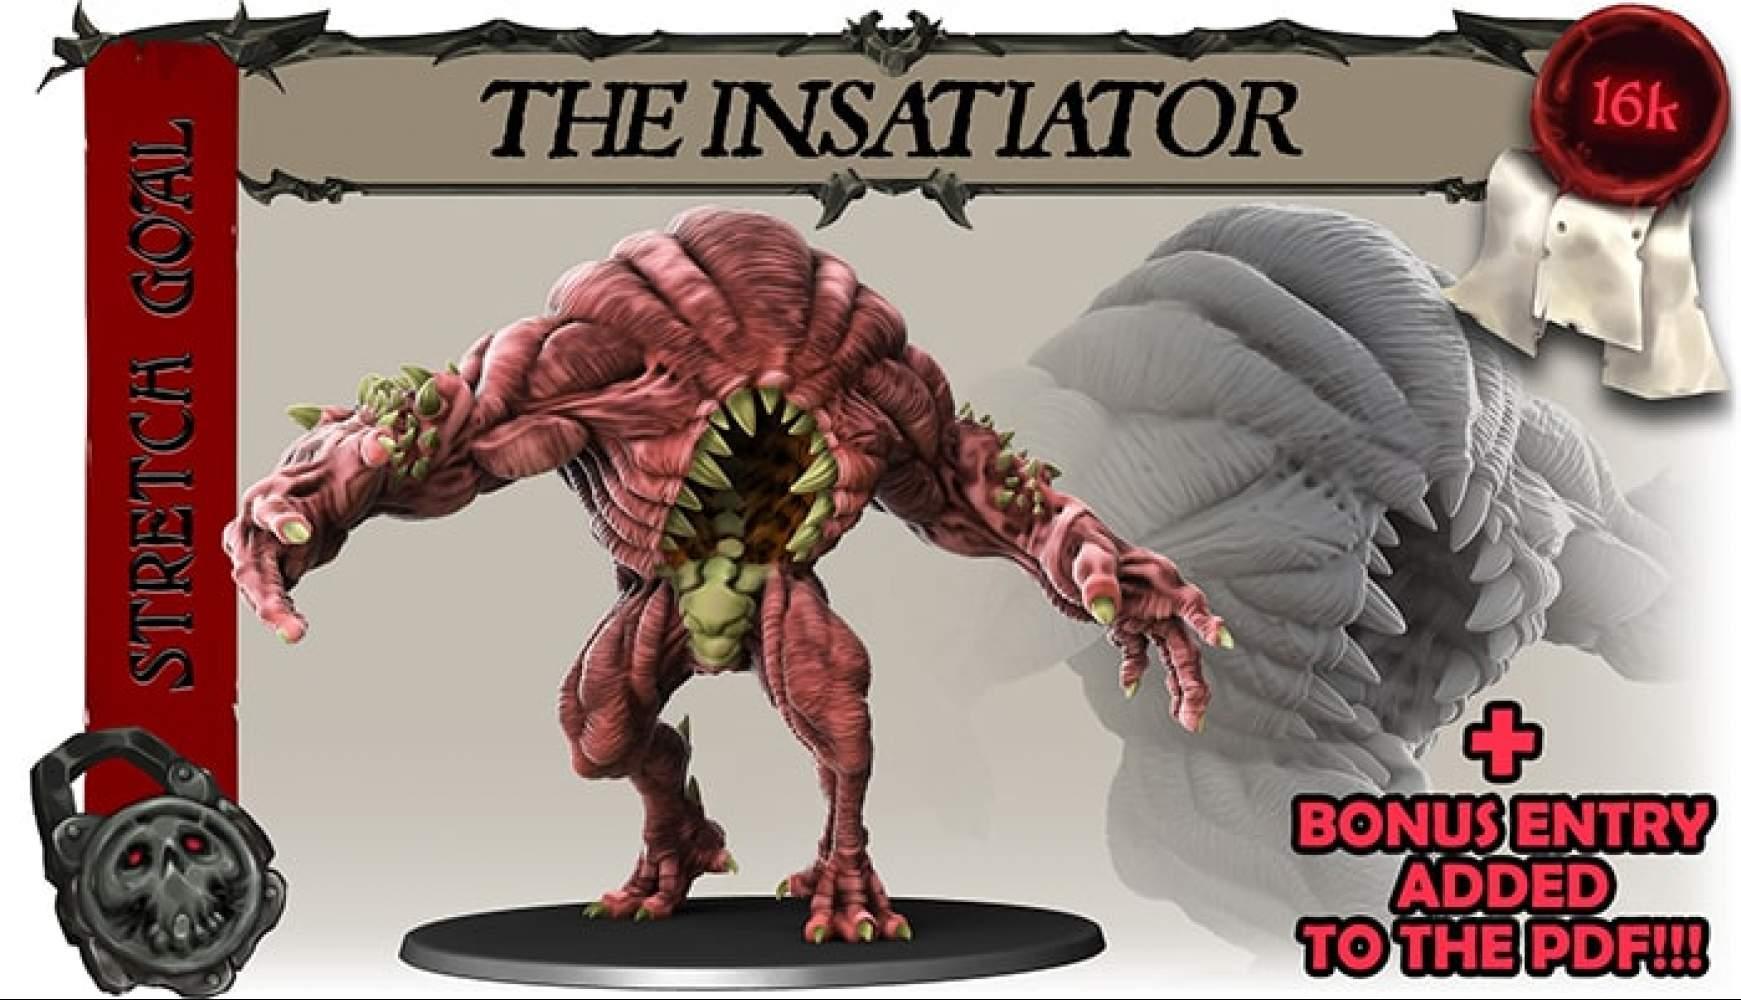 THE INSATIATOR